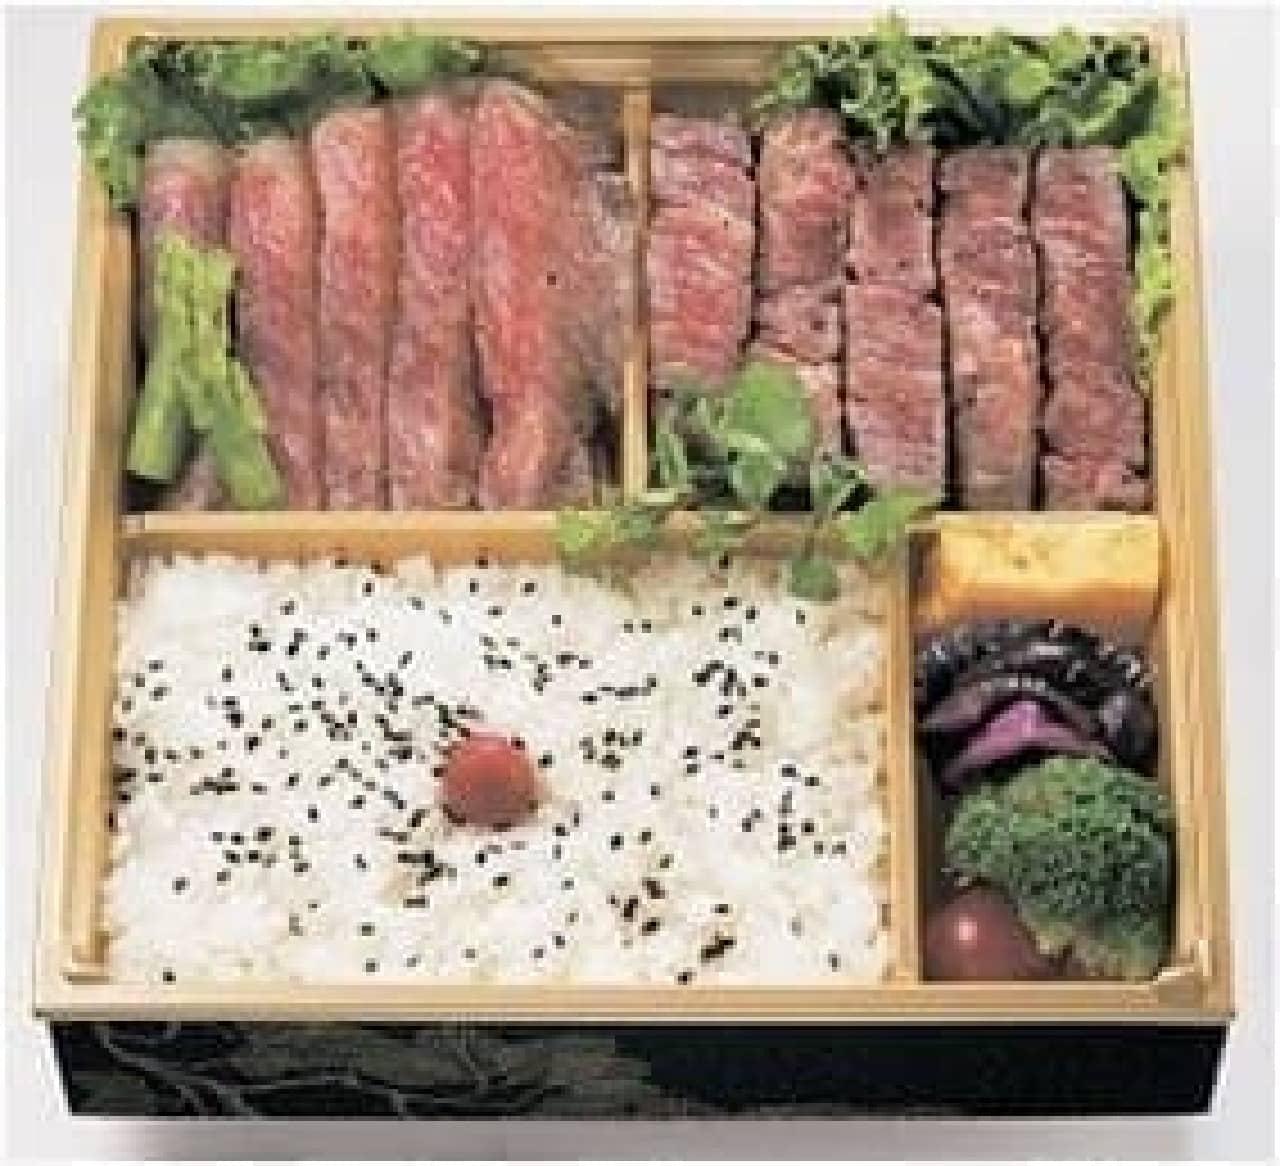 日本橋 日山「山形牛豪華ステーキ弁当」